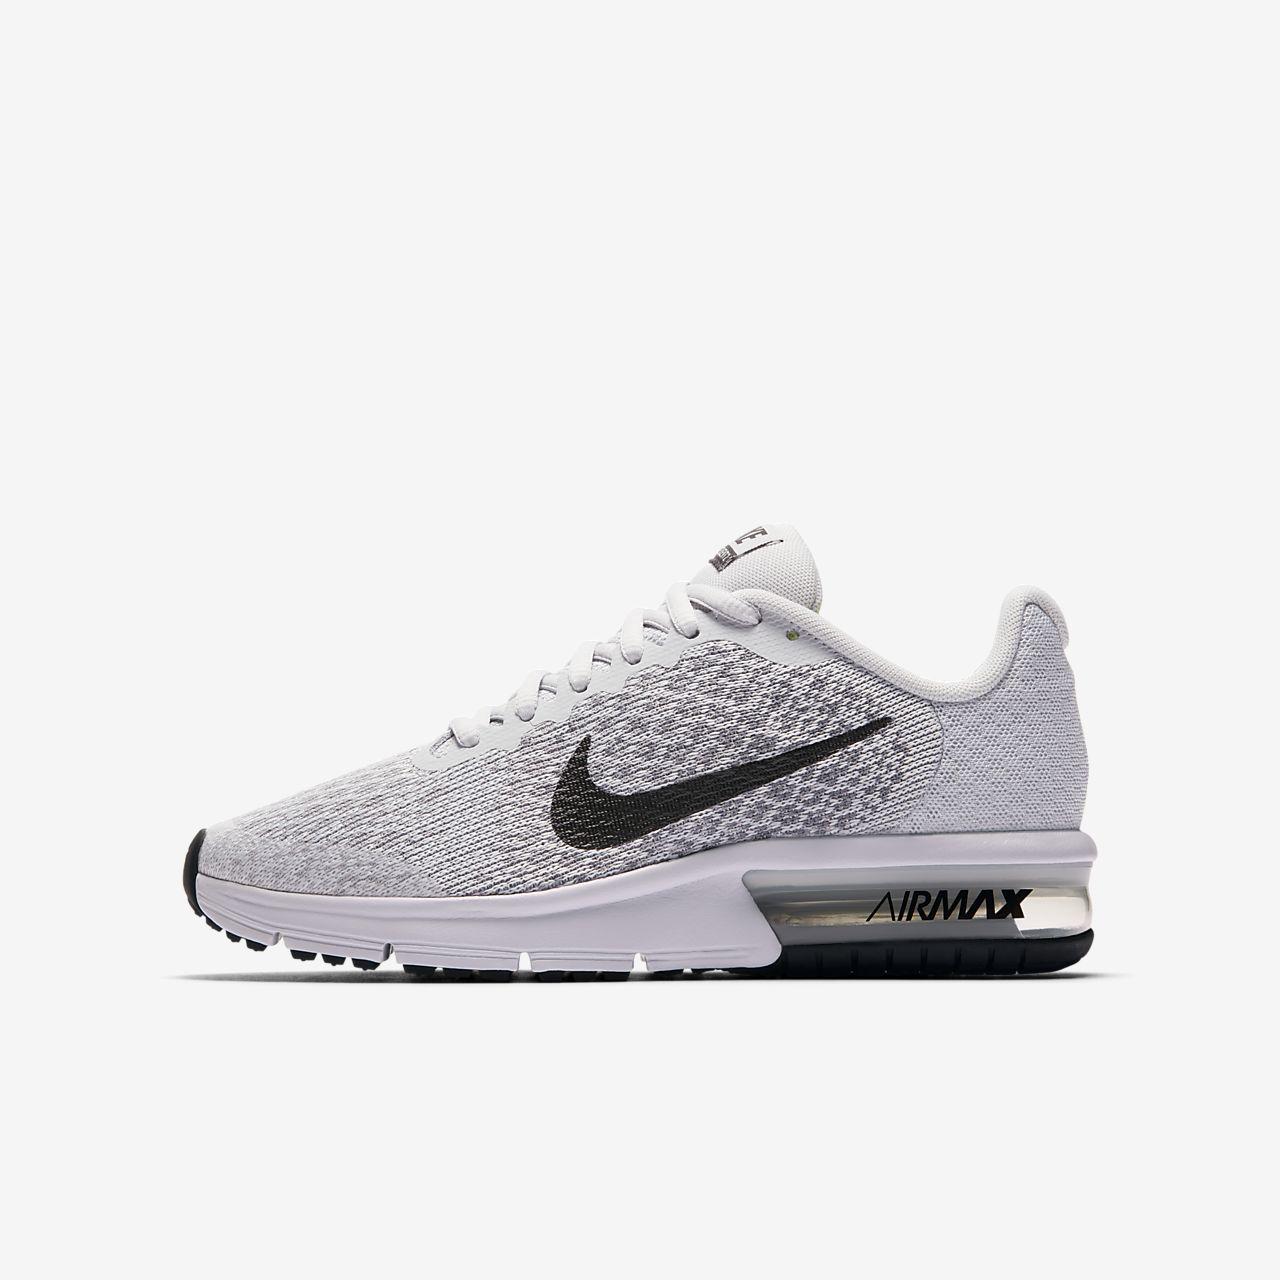 Nike Laufschuhe Günstig Kaufen (126010INXL) | Nike Air Max